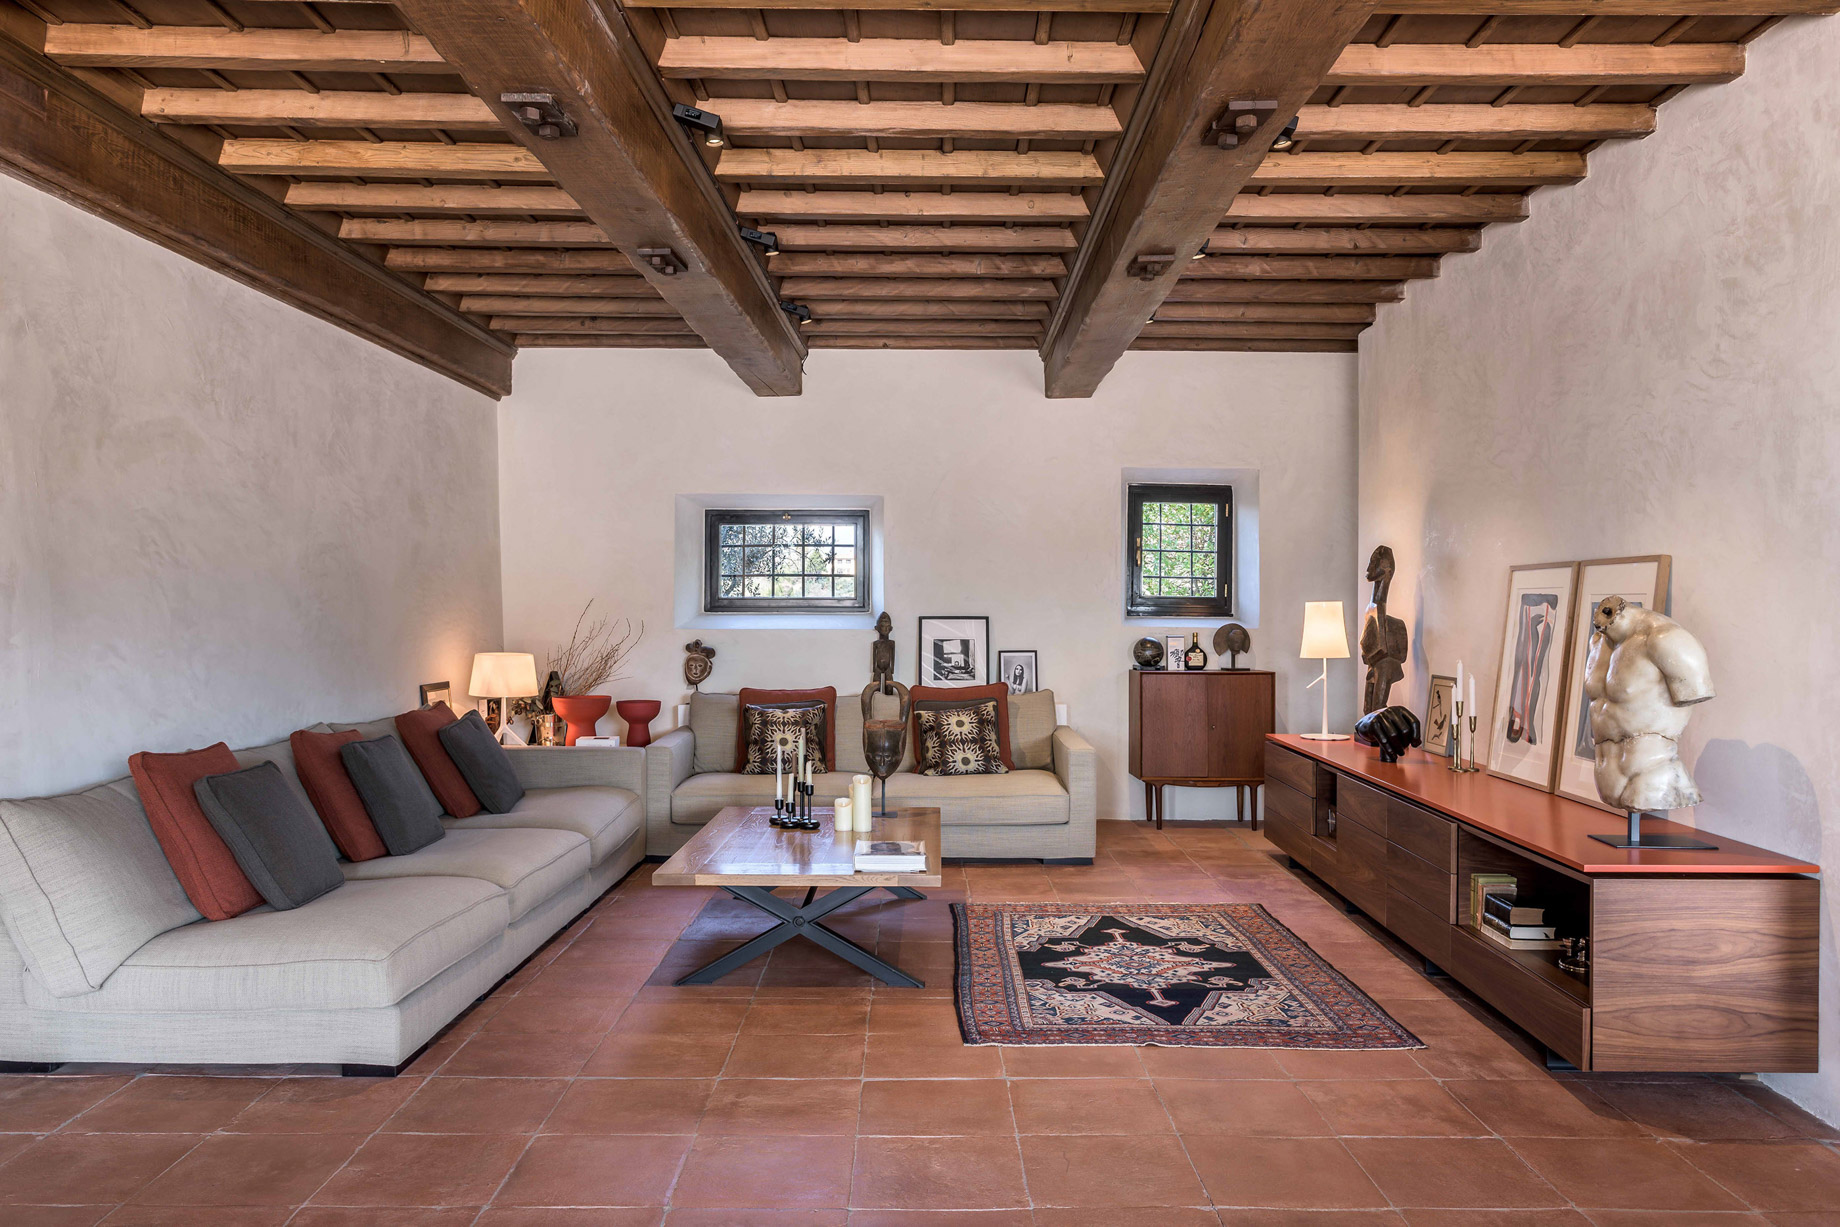 001 – Maison Ache Interior Design Tuscany, Italy – Pierattelli Architetture